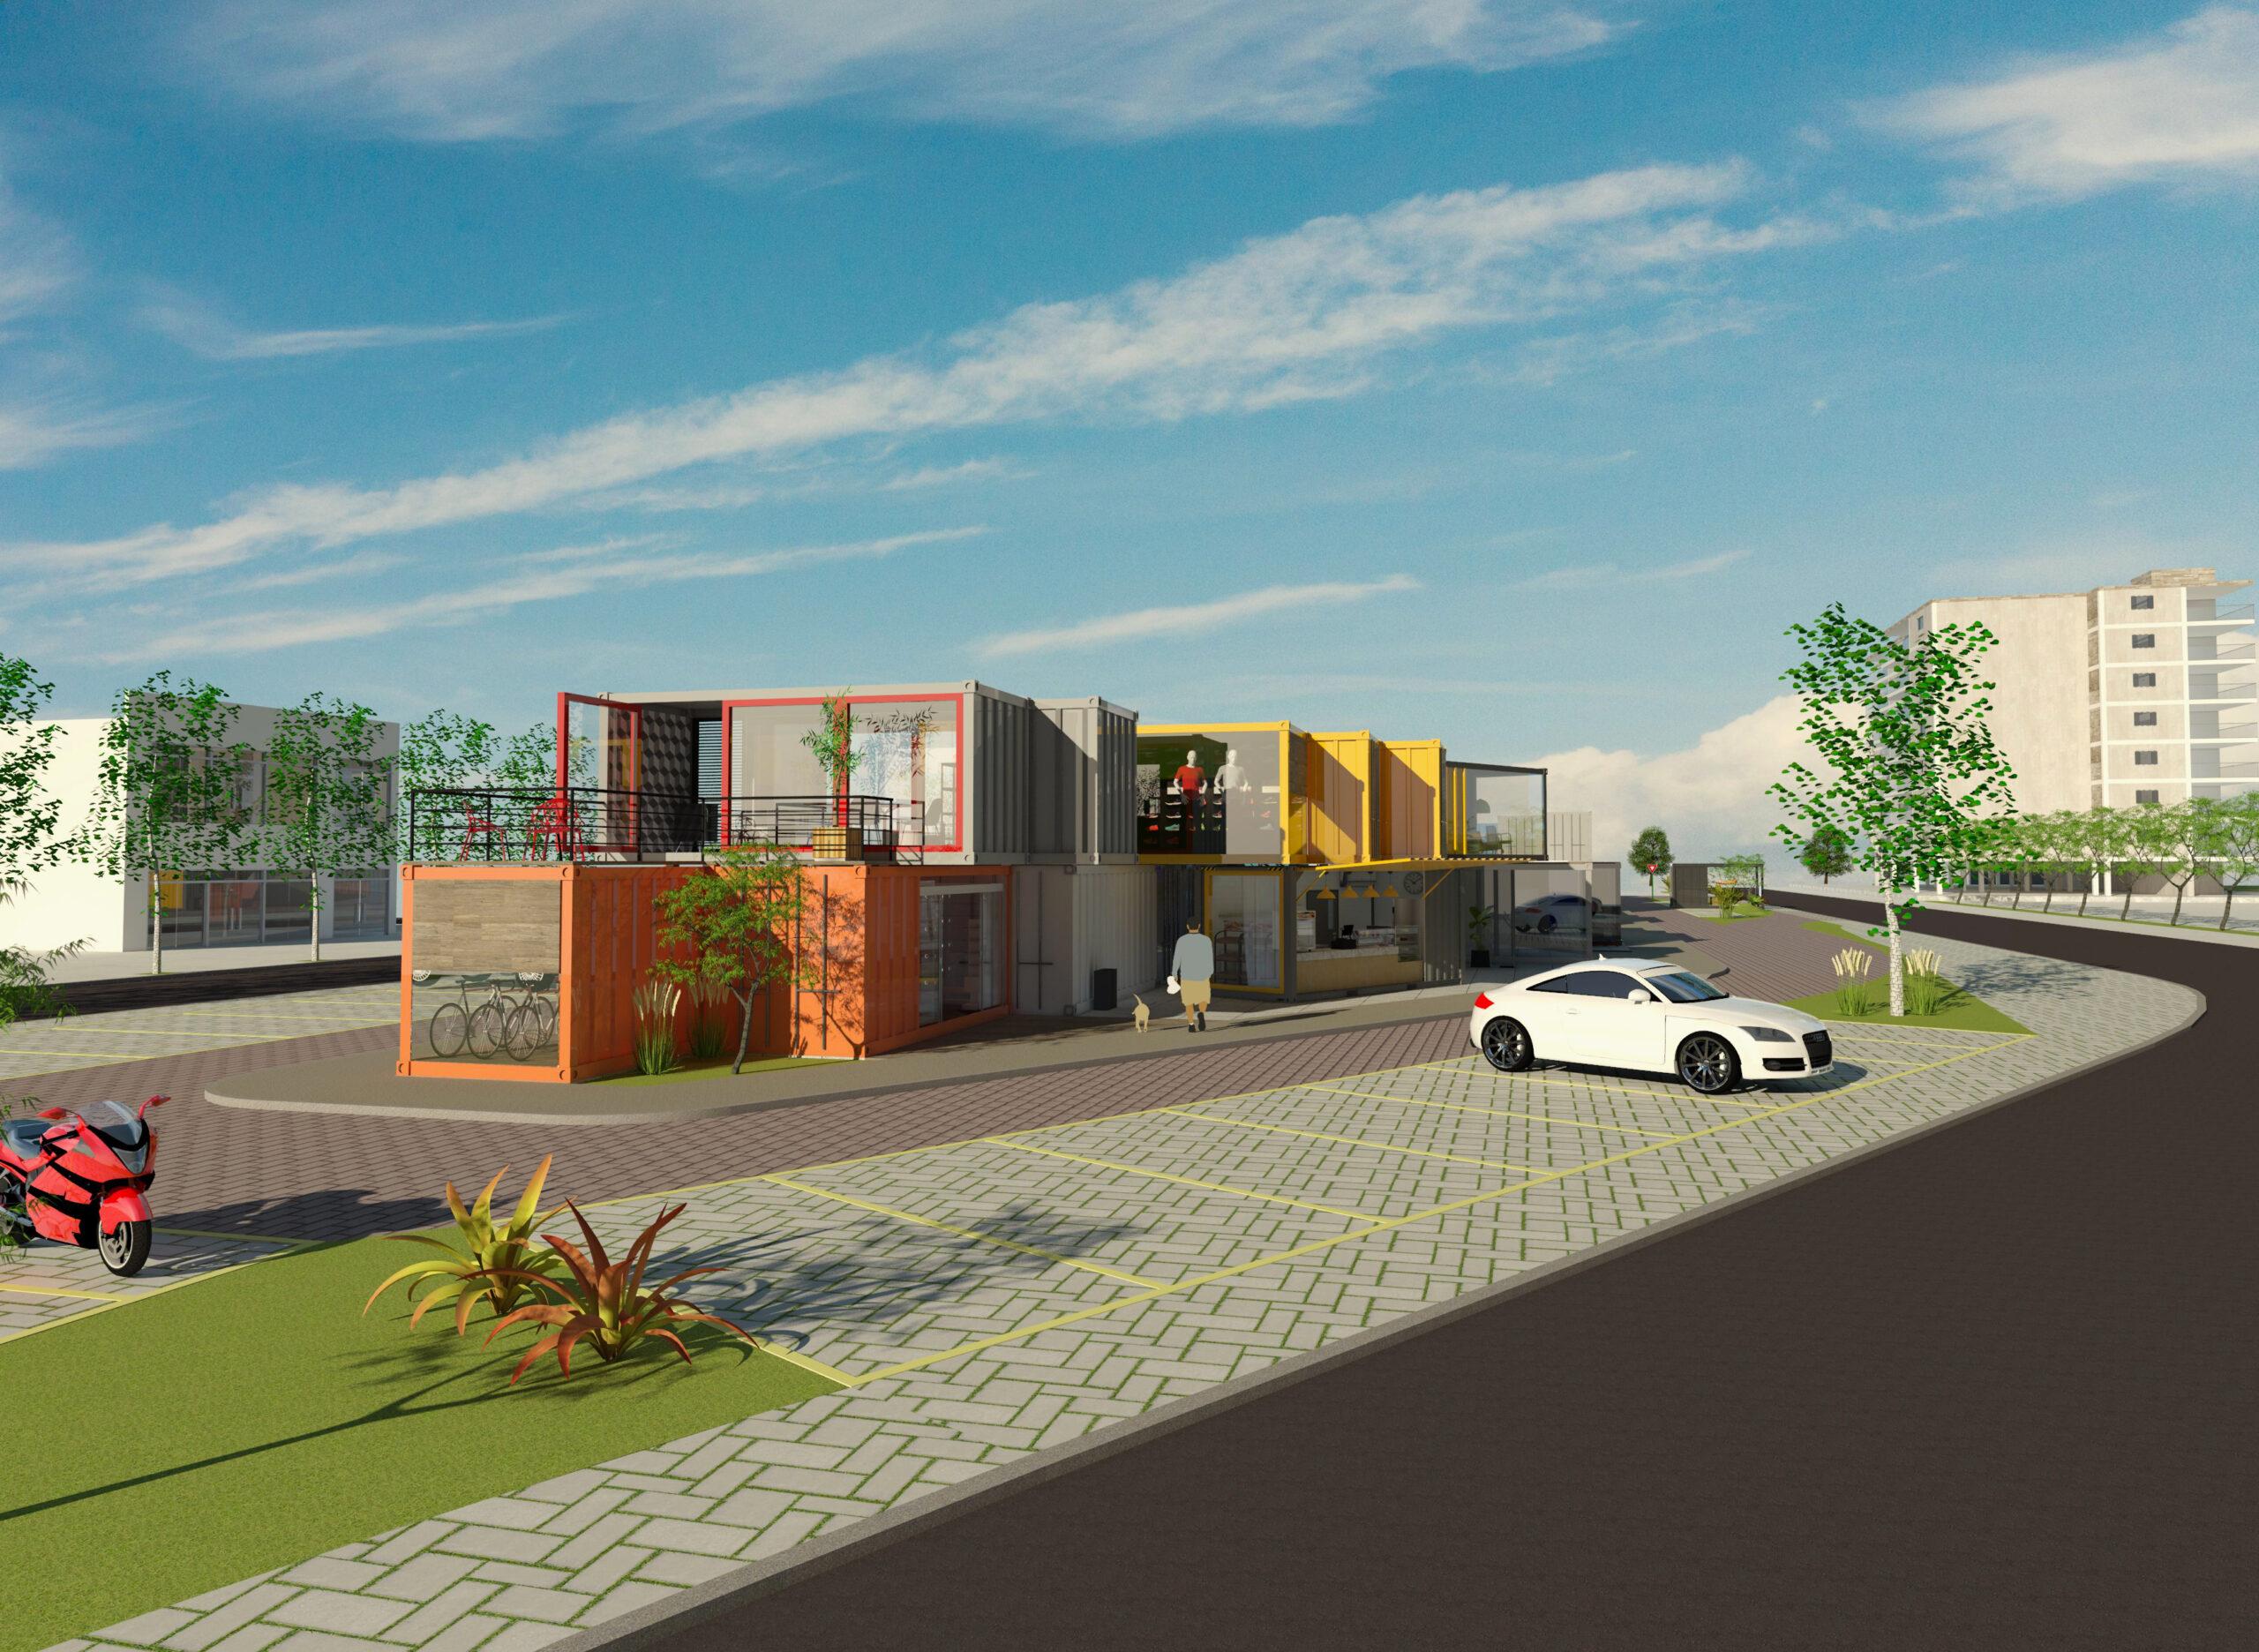 arquitetura-comercial-shopping-container(1)